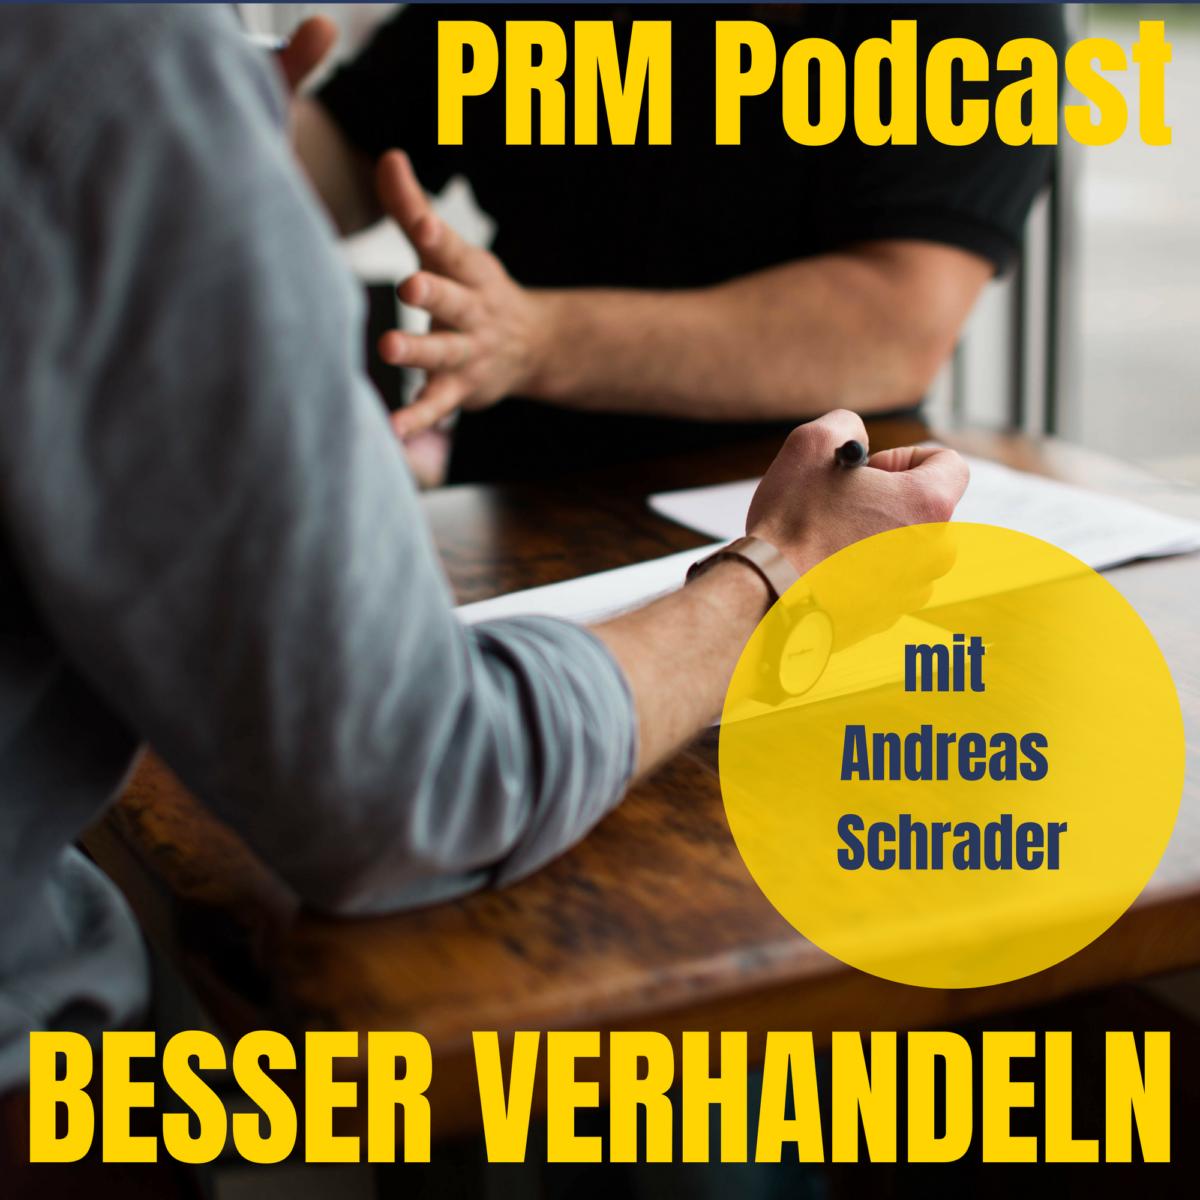 Abbildung PRM Podcast